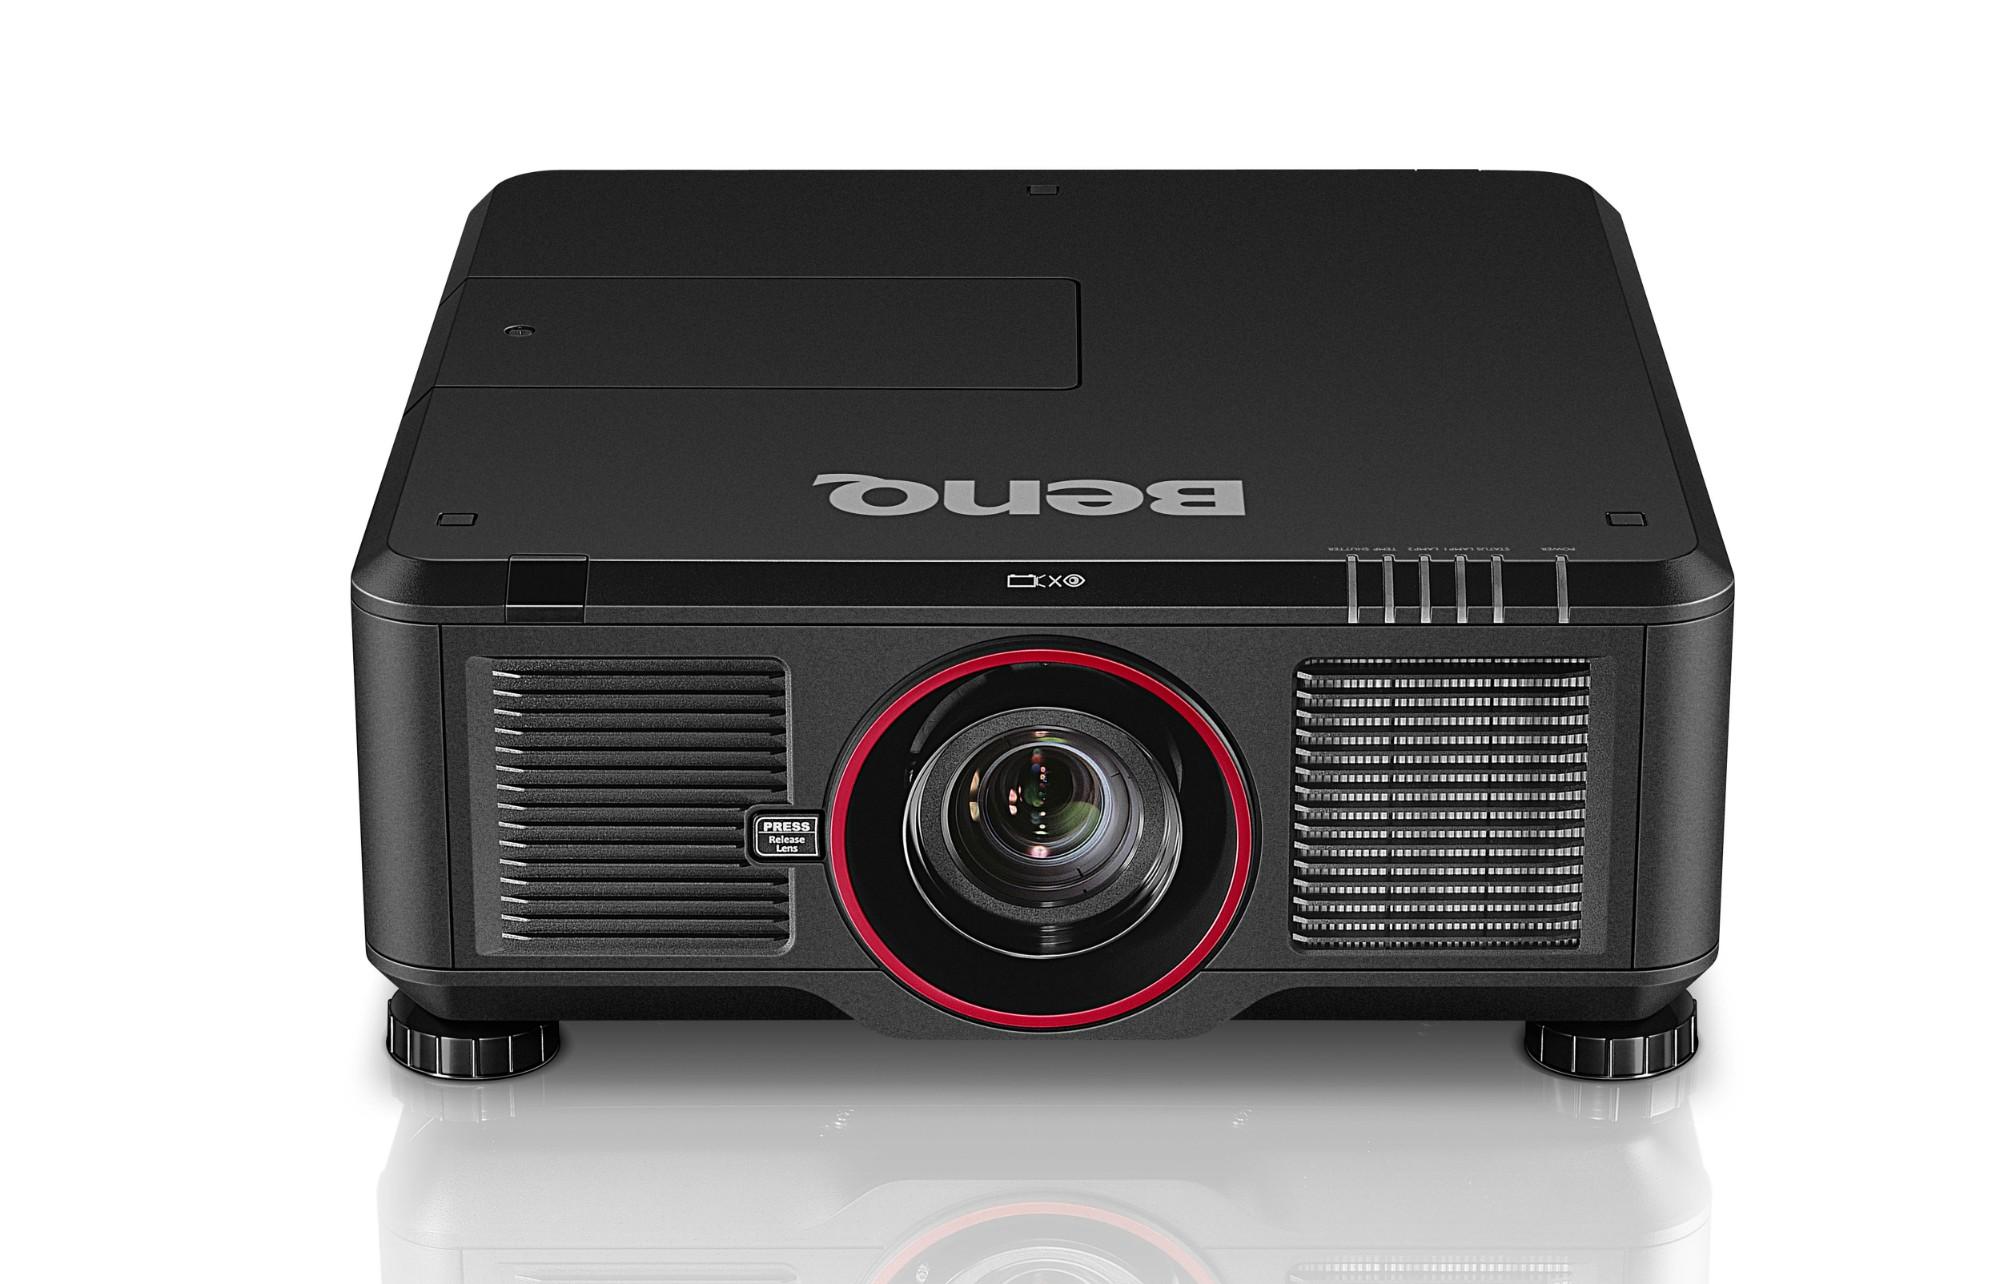 Benq PW9620 6700ANSI lumens DLP WXGA (1280x800) Desktop projector Black